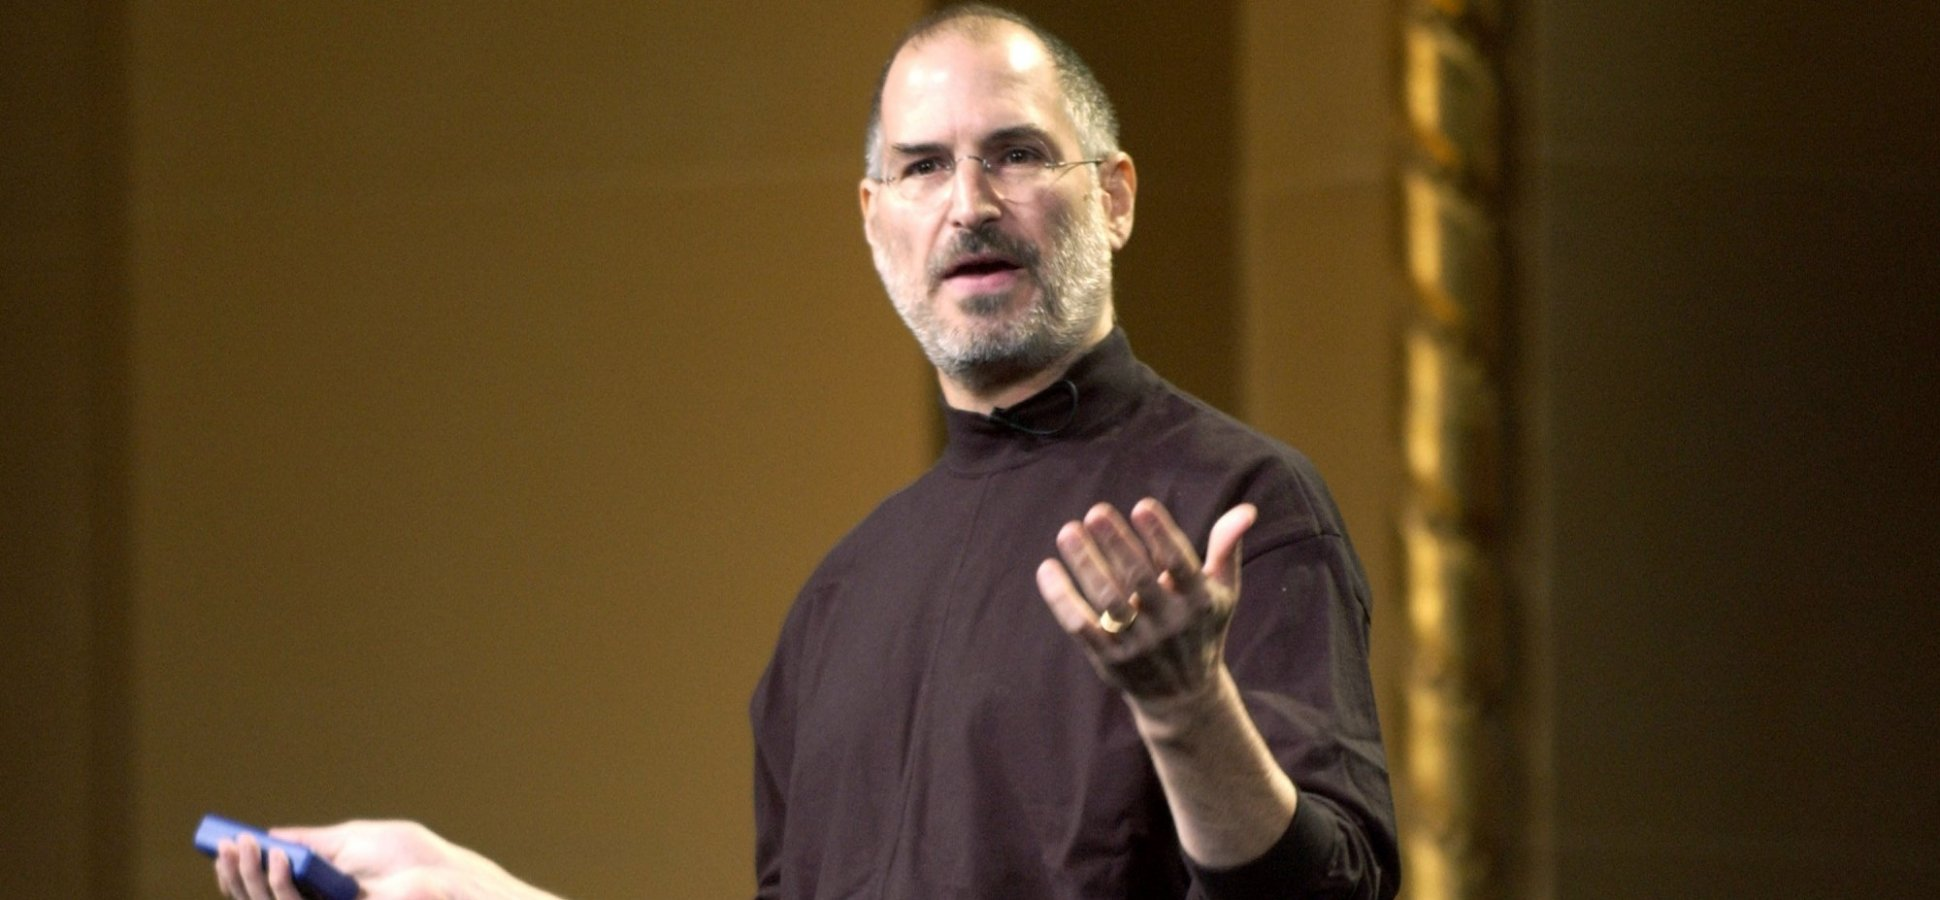 The Secret of Steve Jobs' Remarkable Success Revealed in Just 3 Words